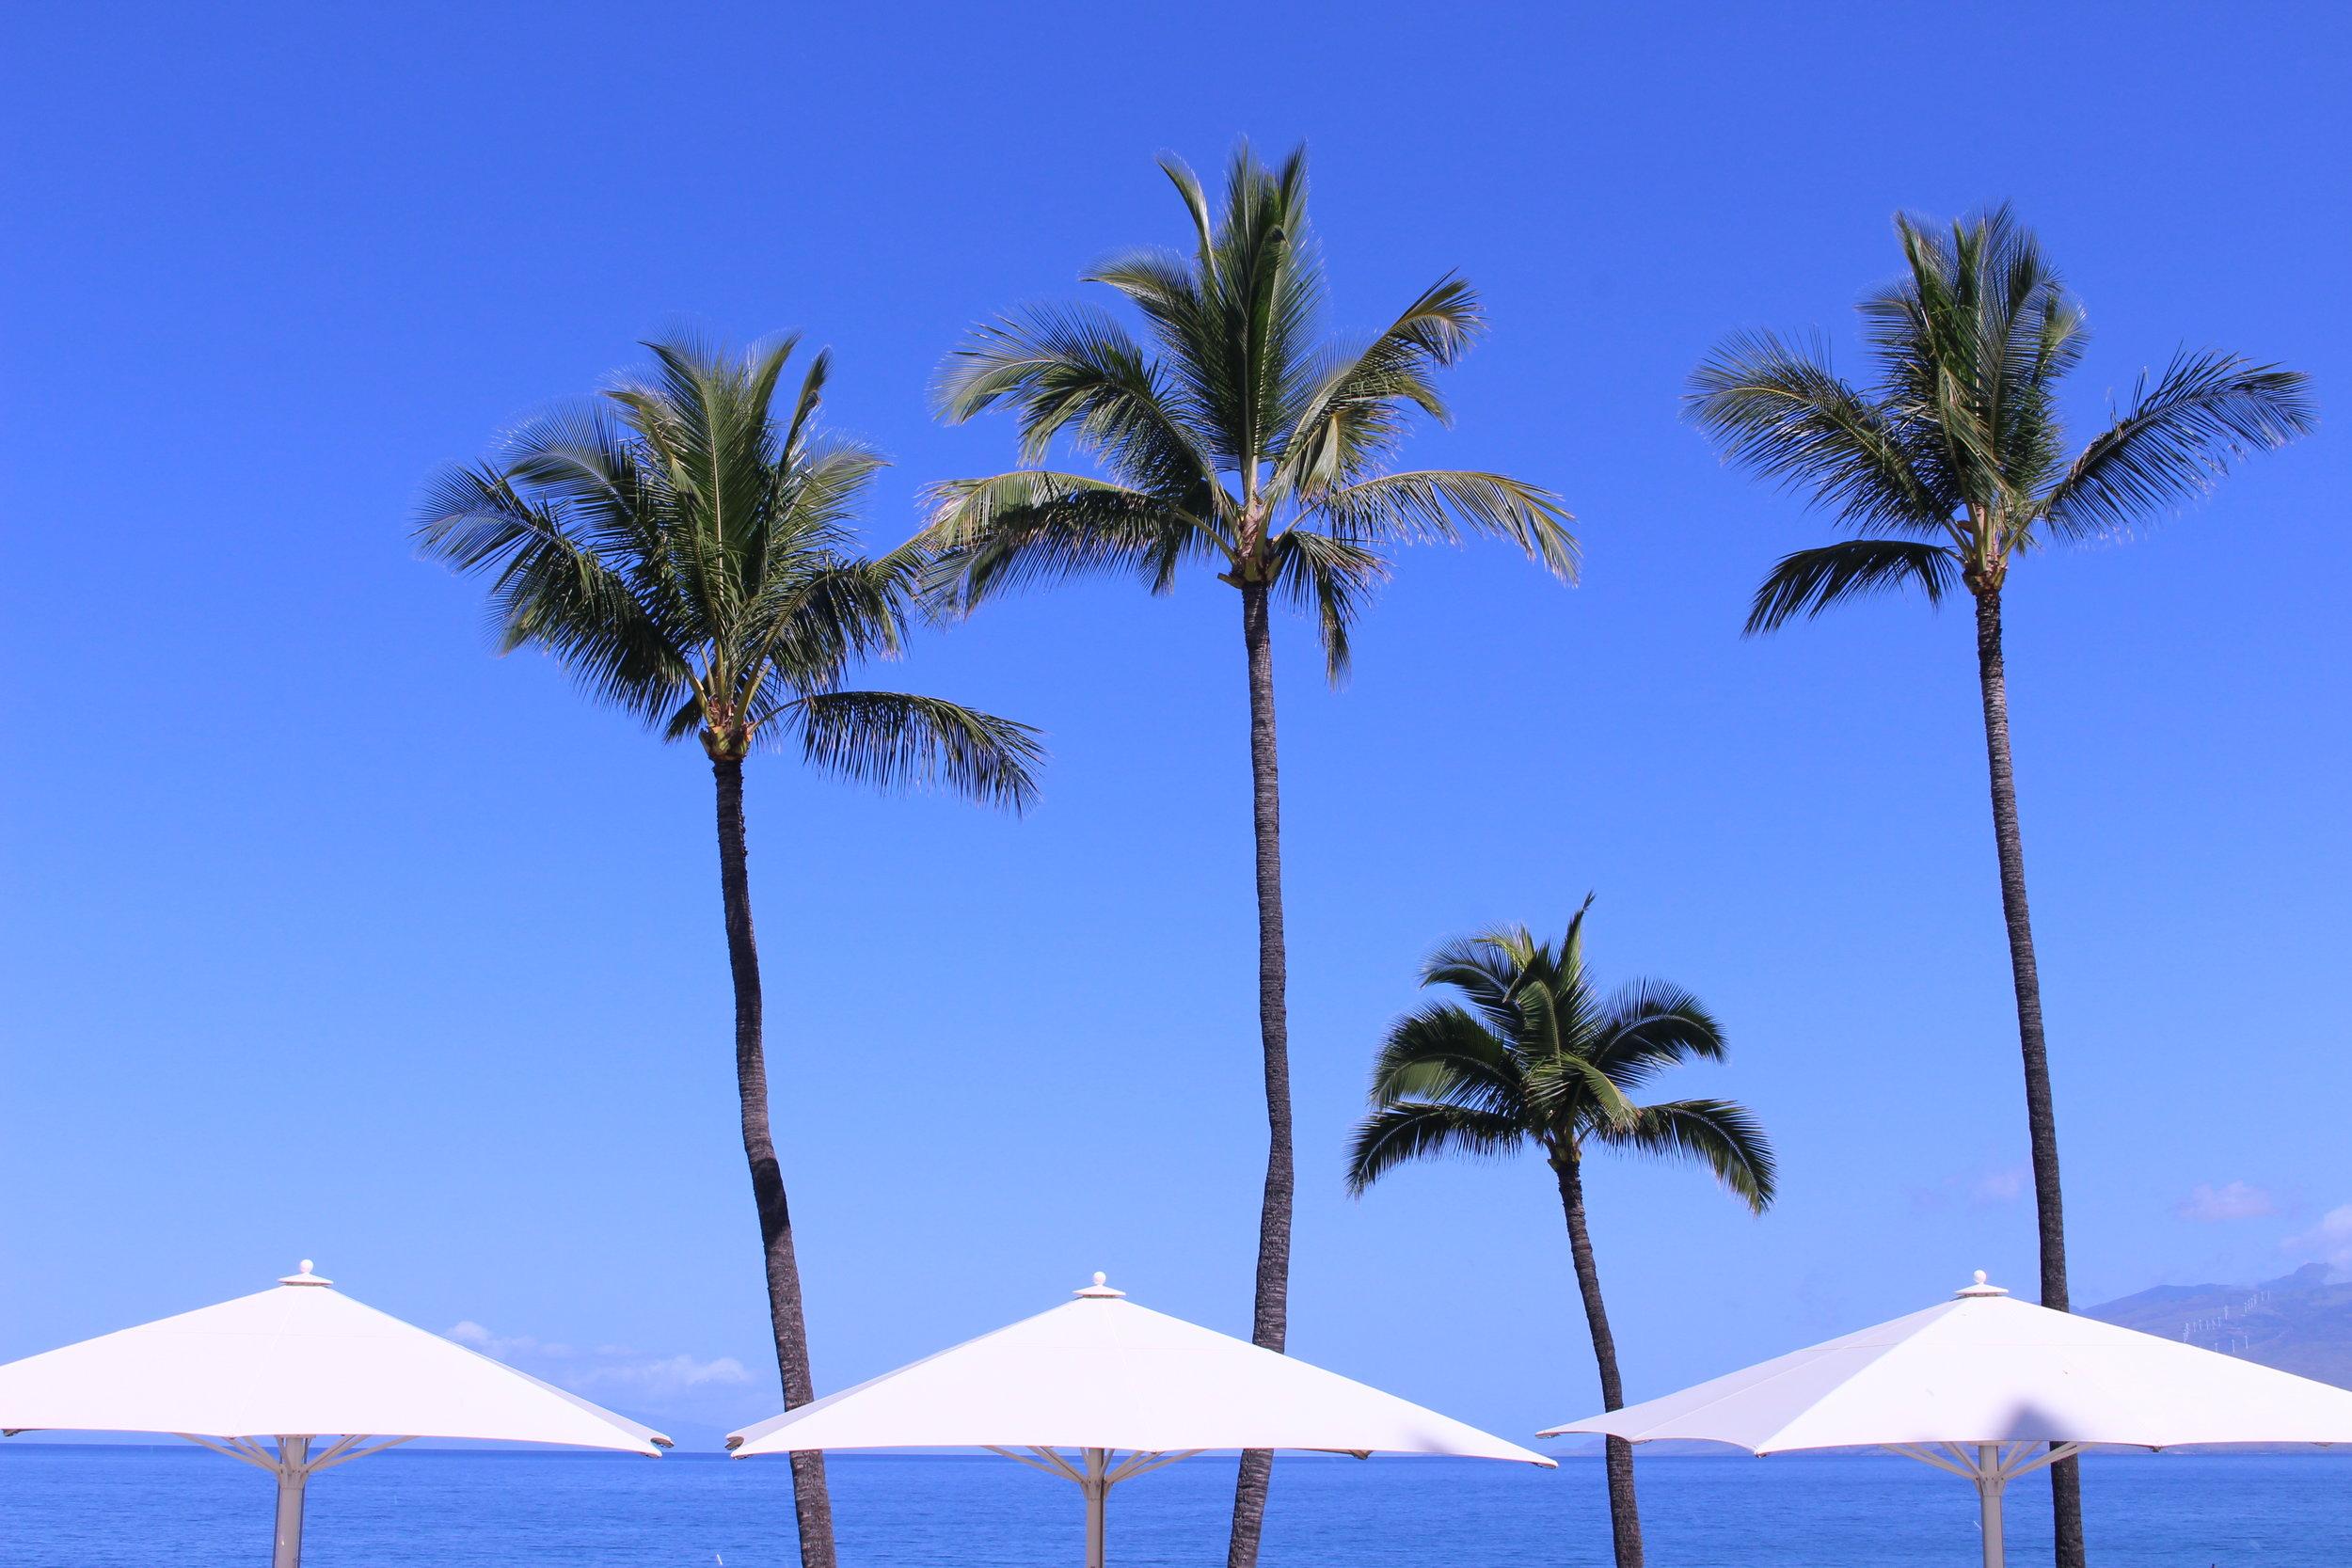 Views at Wailea Beach Resort